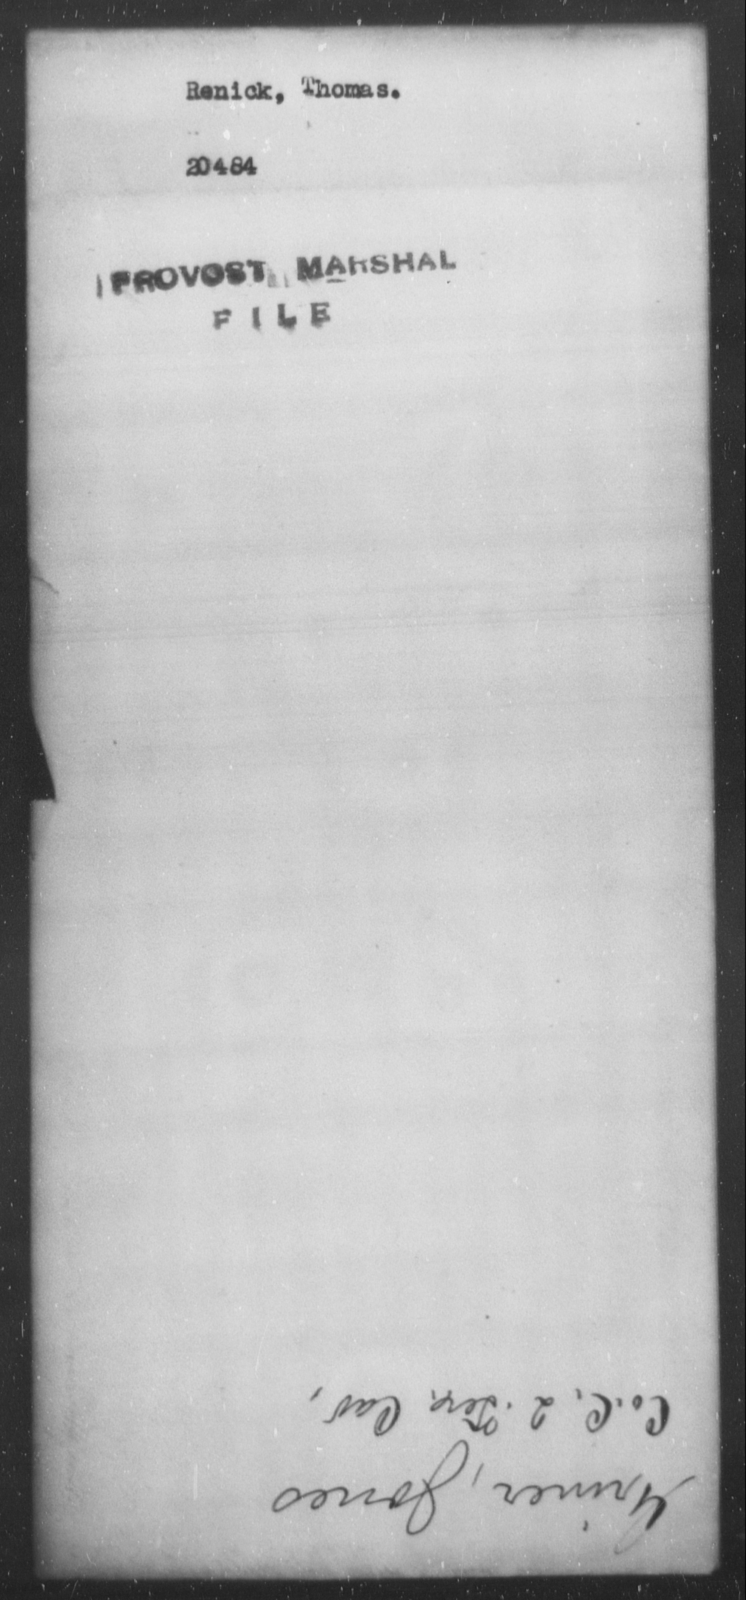 Renick, Thomas - State: [Blank] - Year: [Blank]